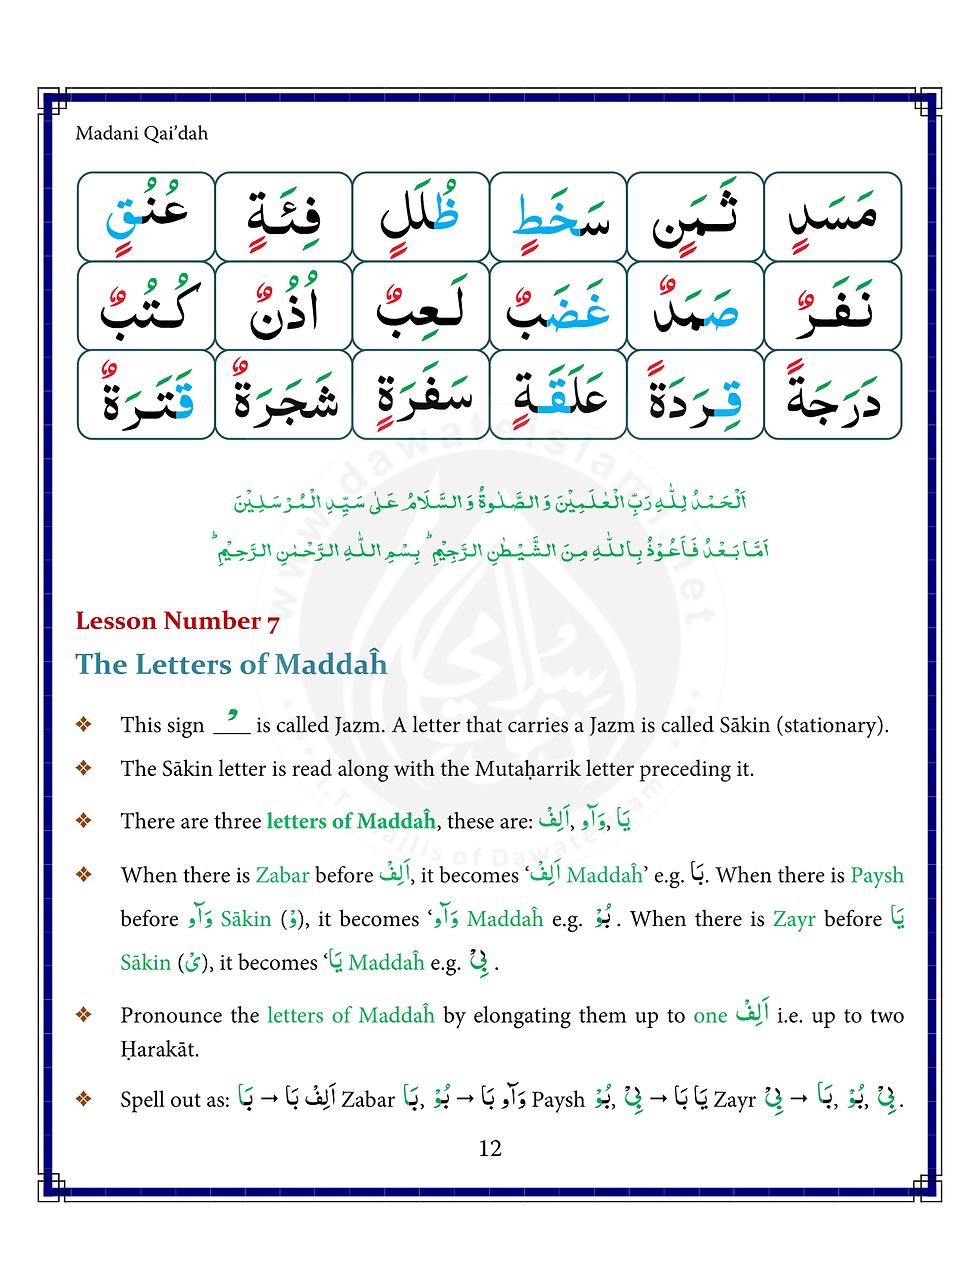 Madani Qaidah-22.png